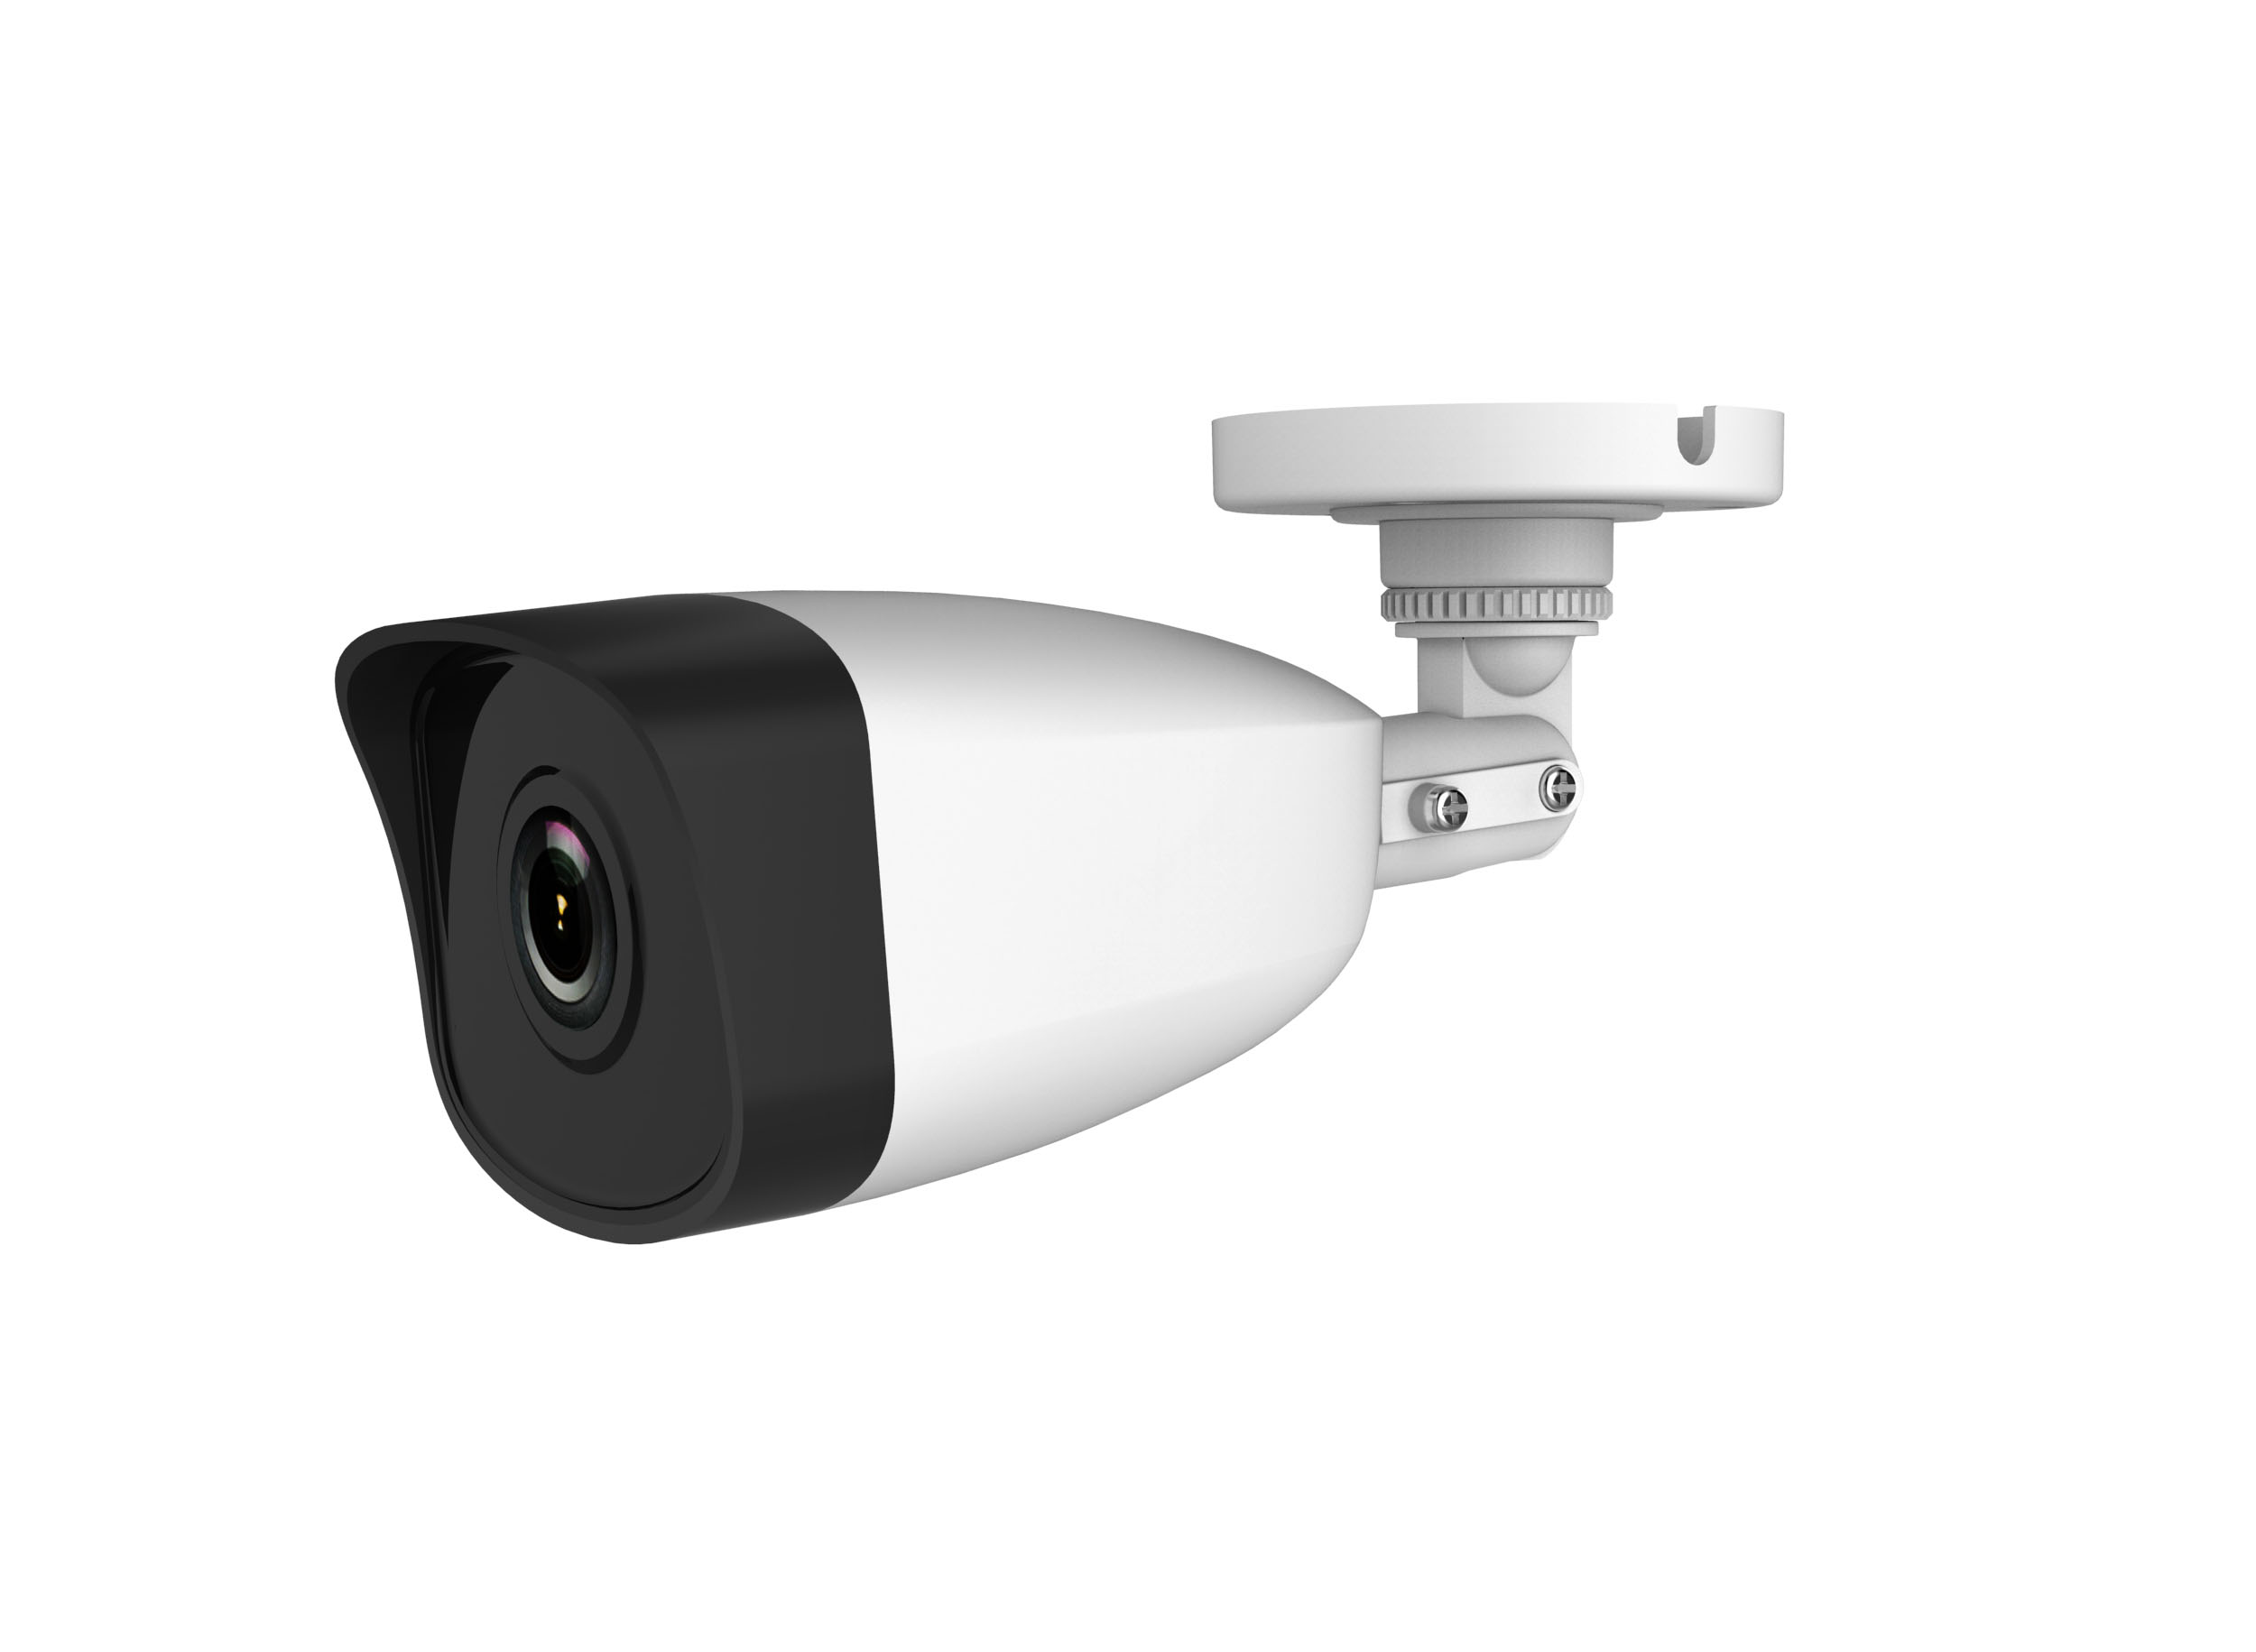 Hikvision Hiwatch 1-4 camera 4MP IP CCTV Camera Kit